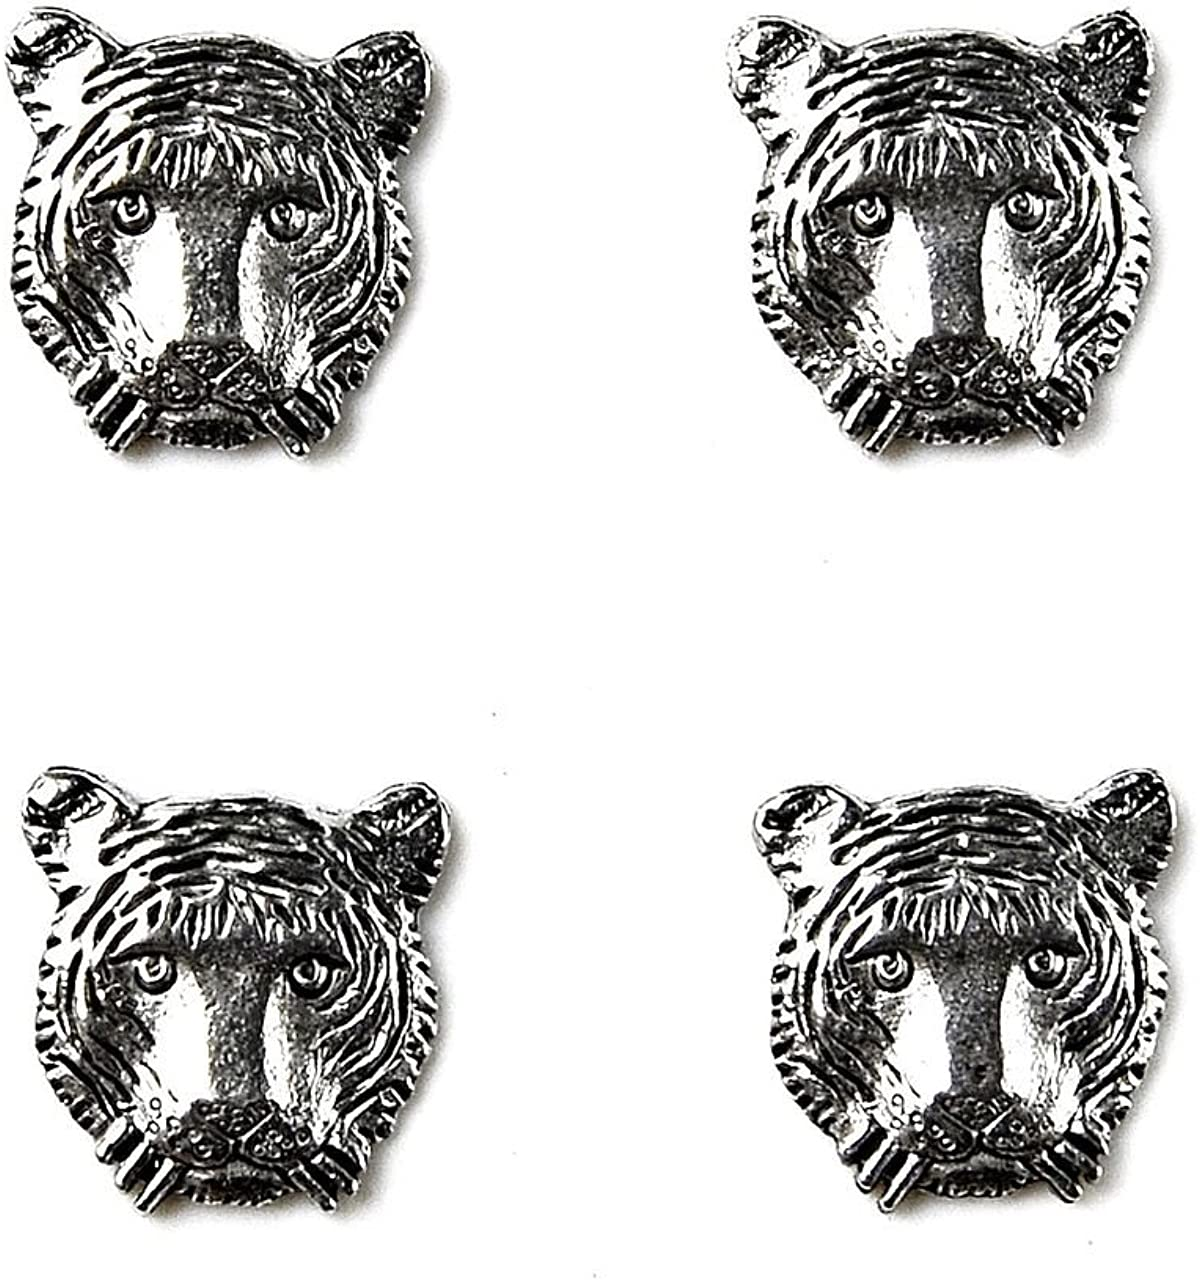 Quality Handcrafts Guaranteed Tiger Tuxedo Studs